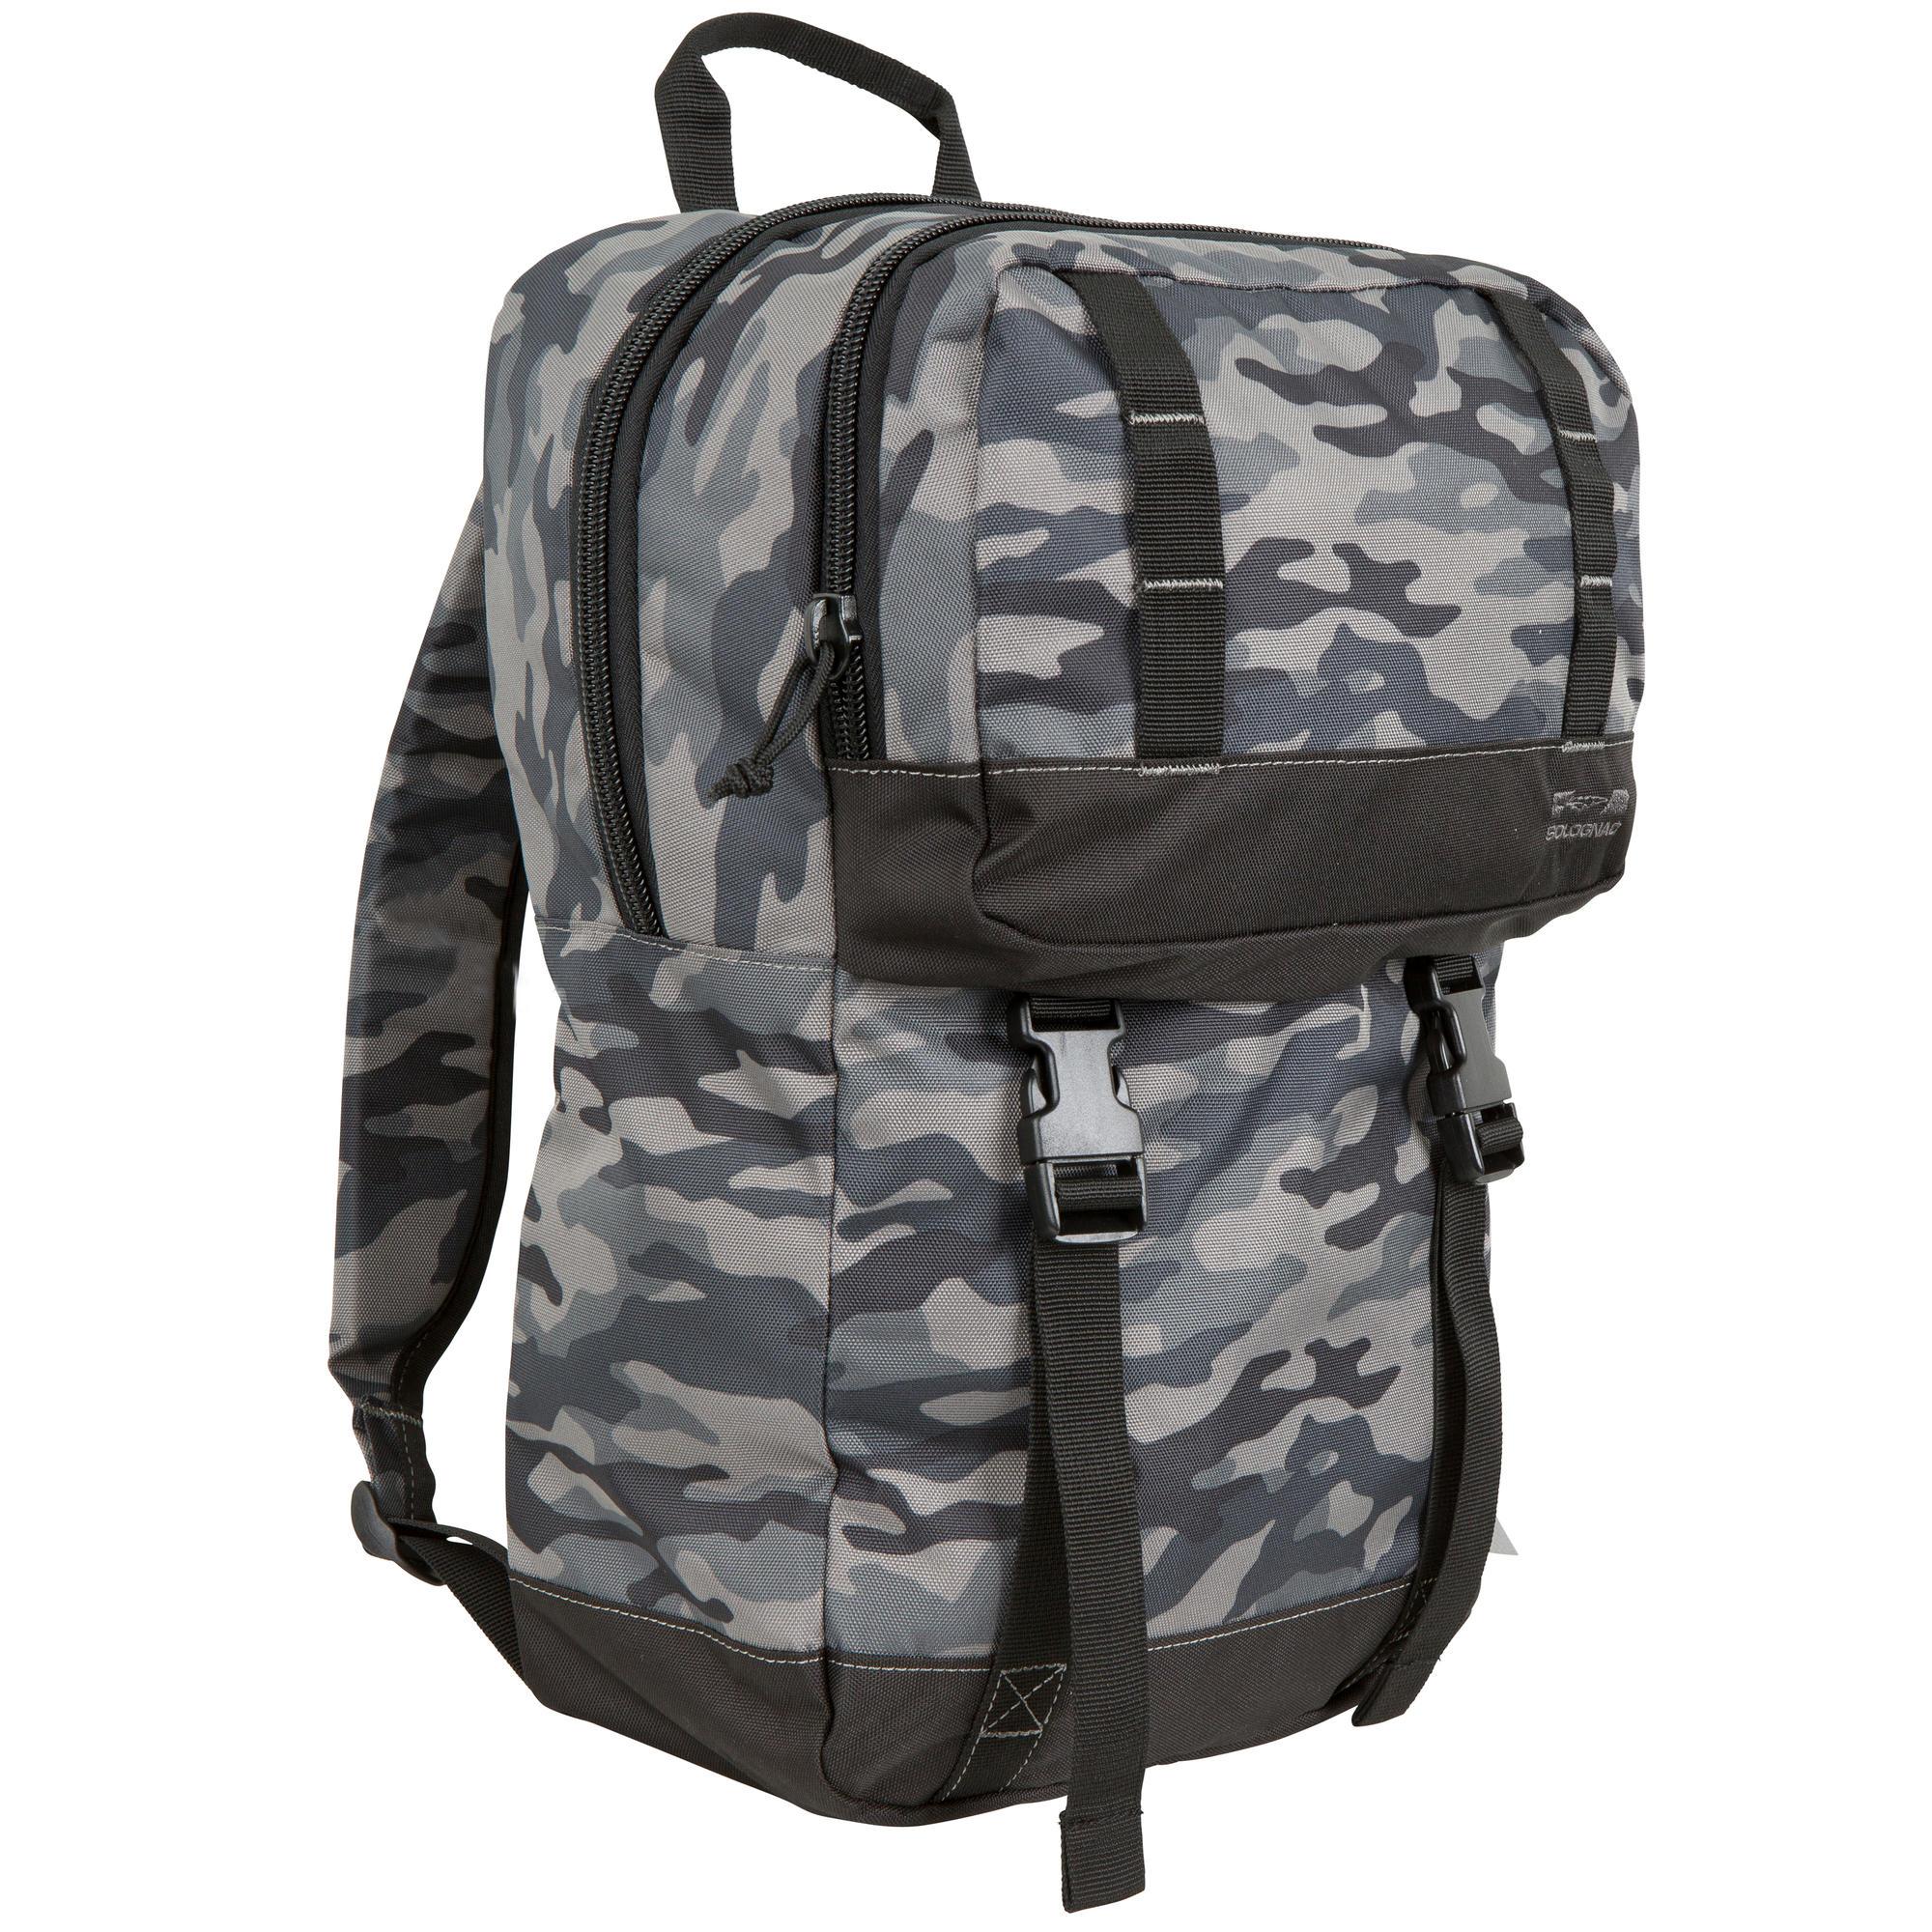 sac a dos de transport 20 litres camouflage noir solognac. Black Bedroom Furniture Sets. Home Design Ideas